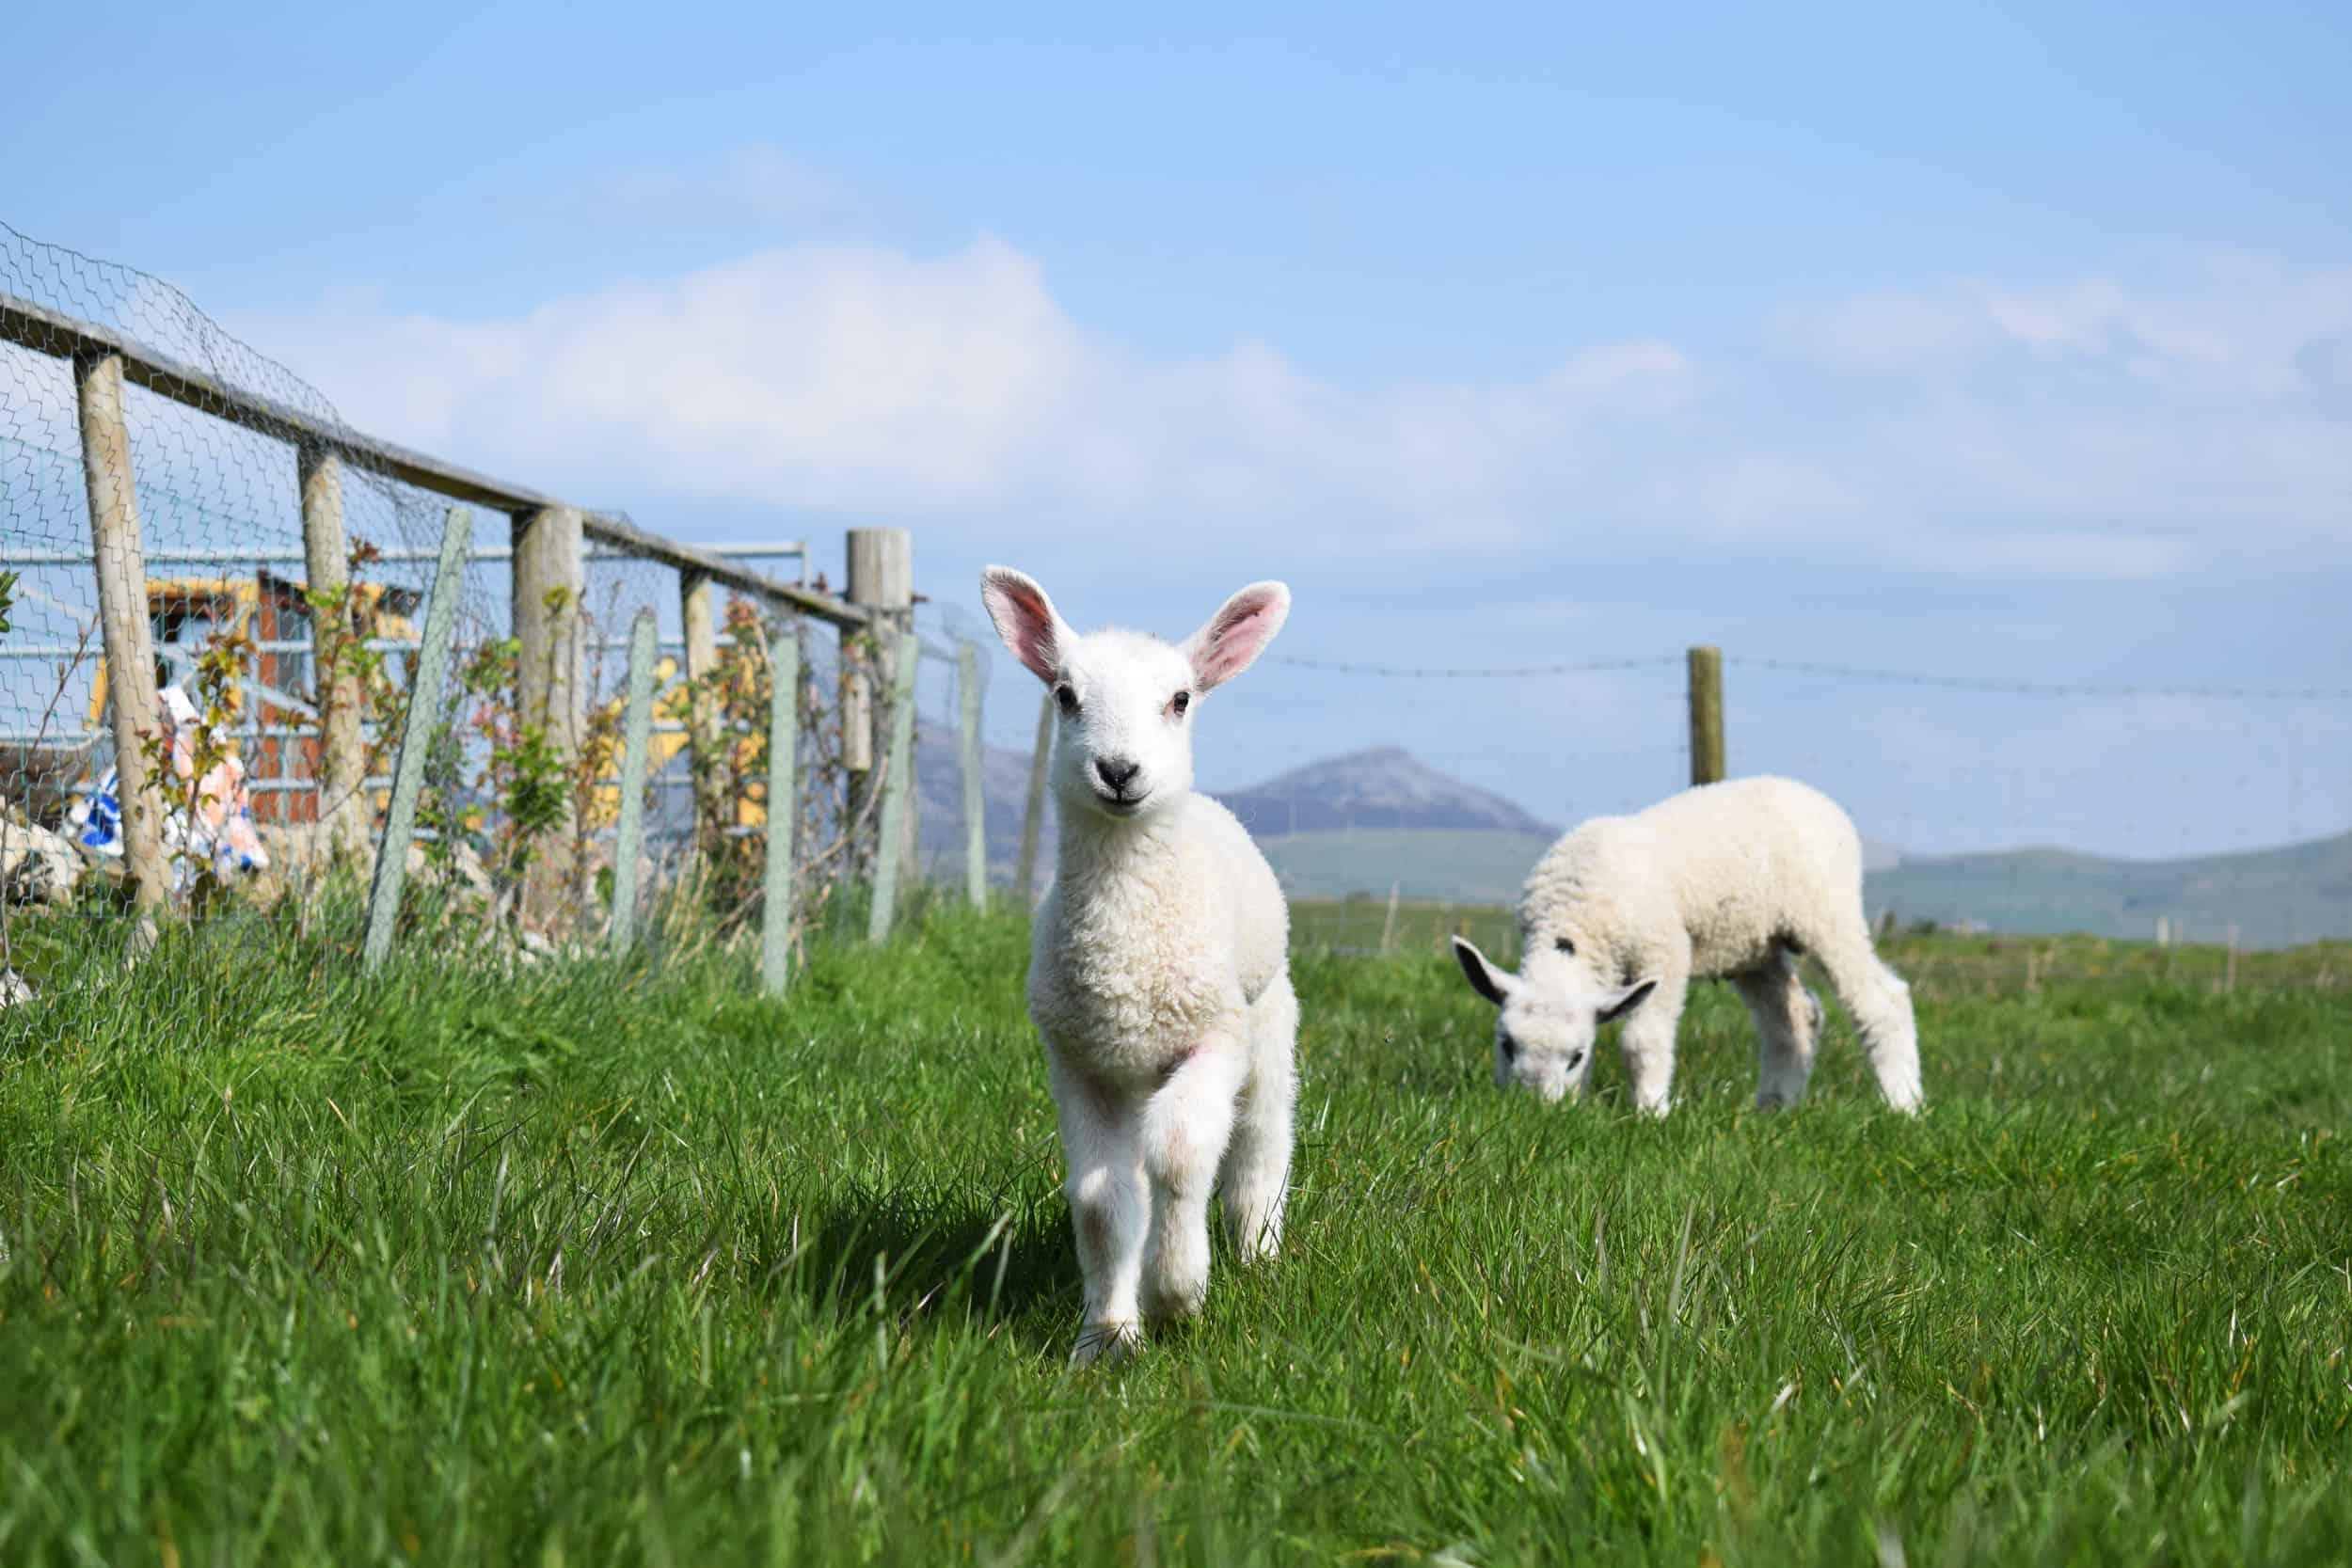 Lily lambs bfl blueface leicester sheep ewe lamb pet bottle baby lamb